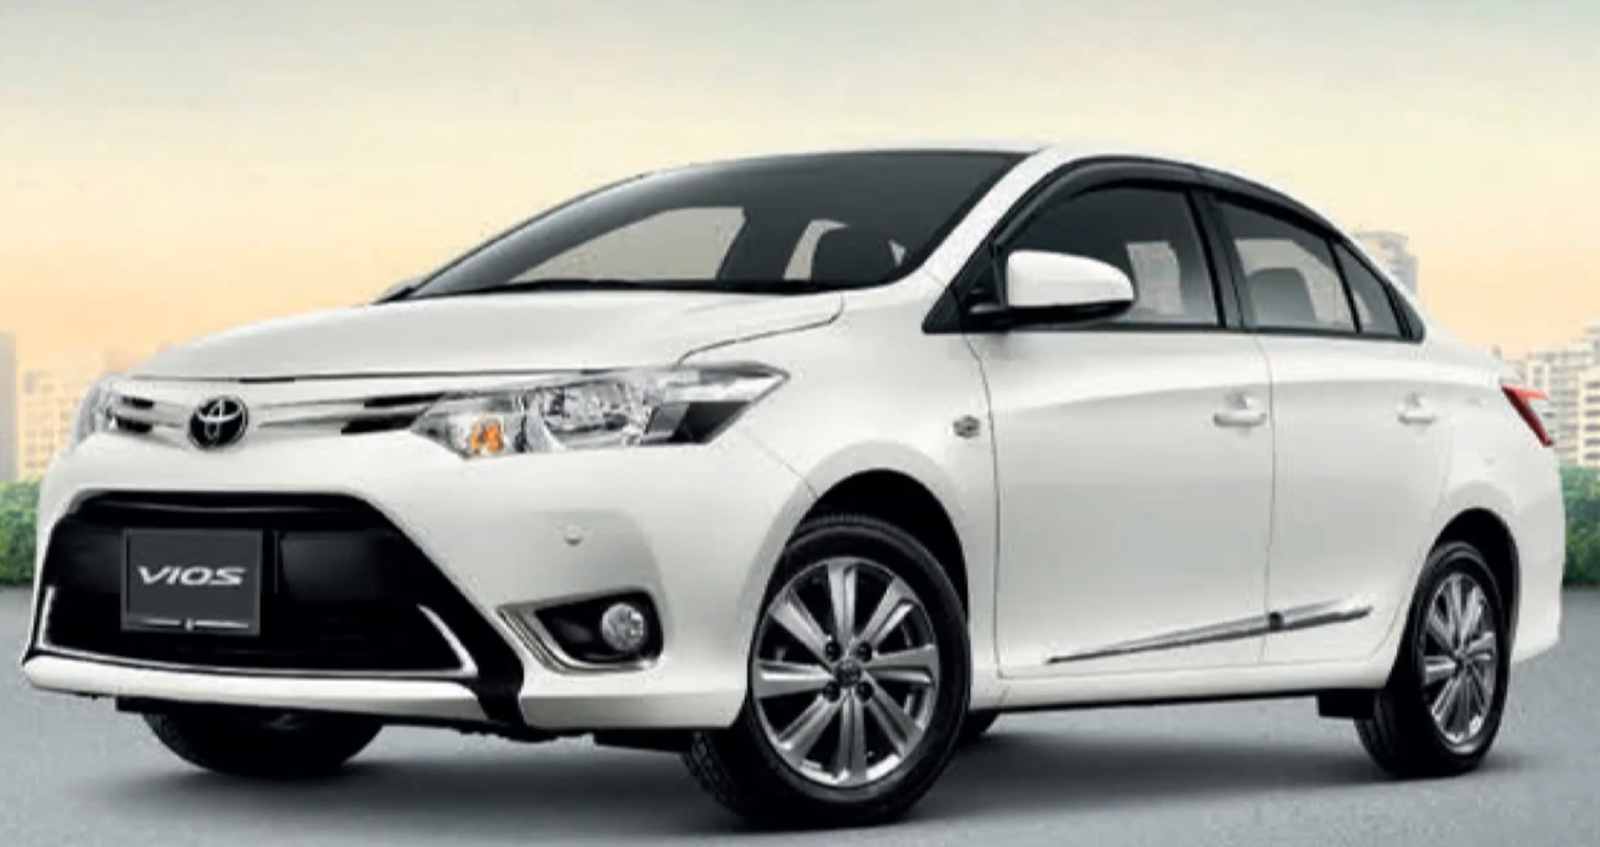 The Ultimate Car Guide Car Profiles Toyota Vios